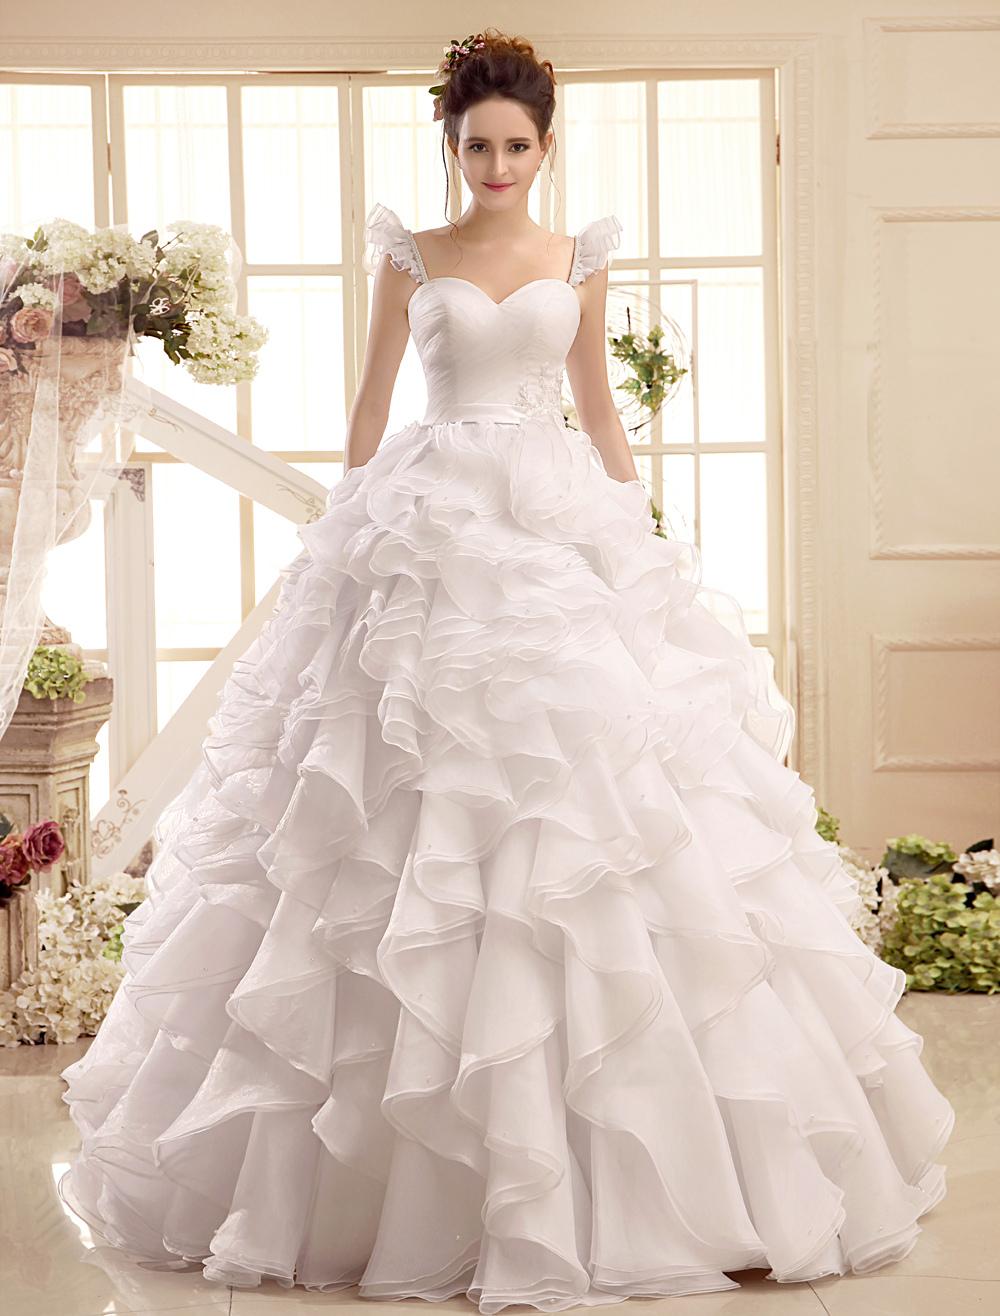 Sweetheart Neck Applique Floor-Length Ivory Wedding Dress For Bride Milanoo